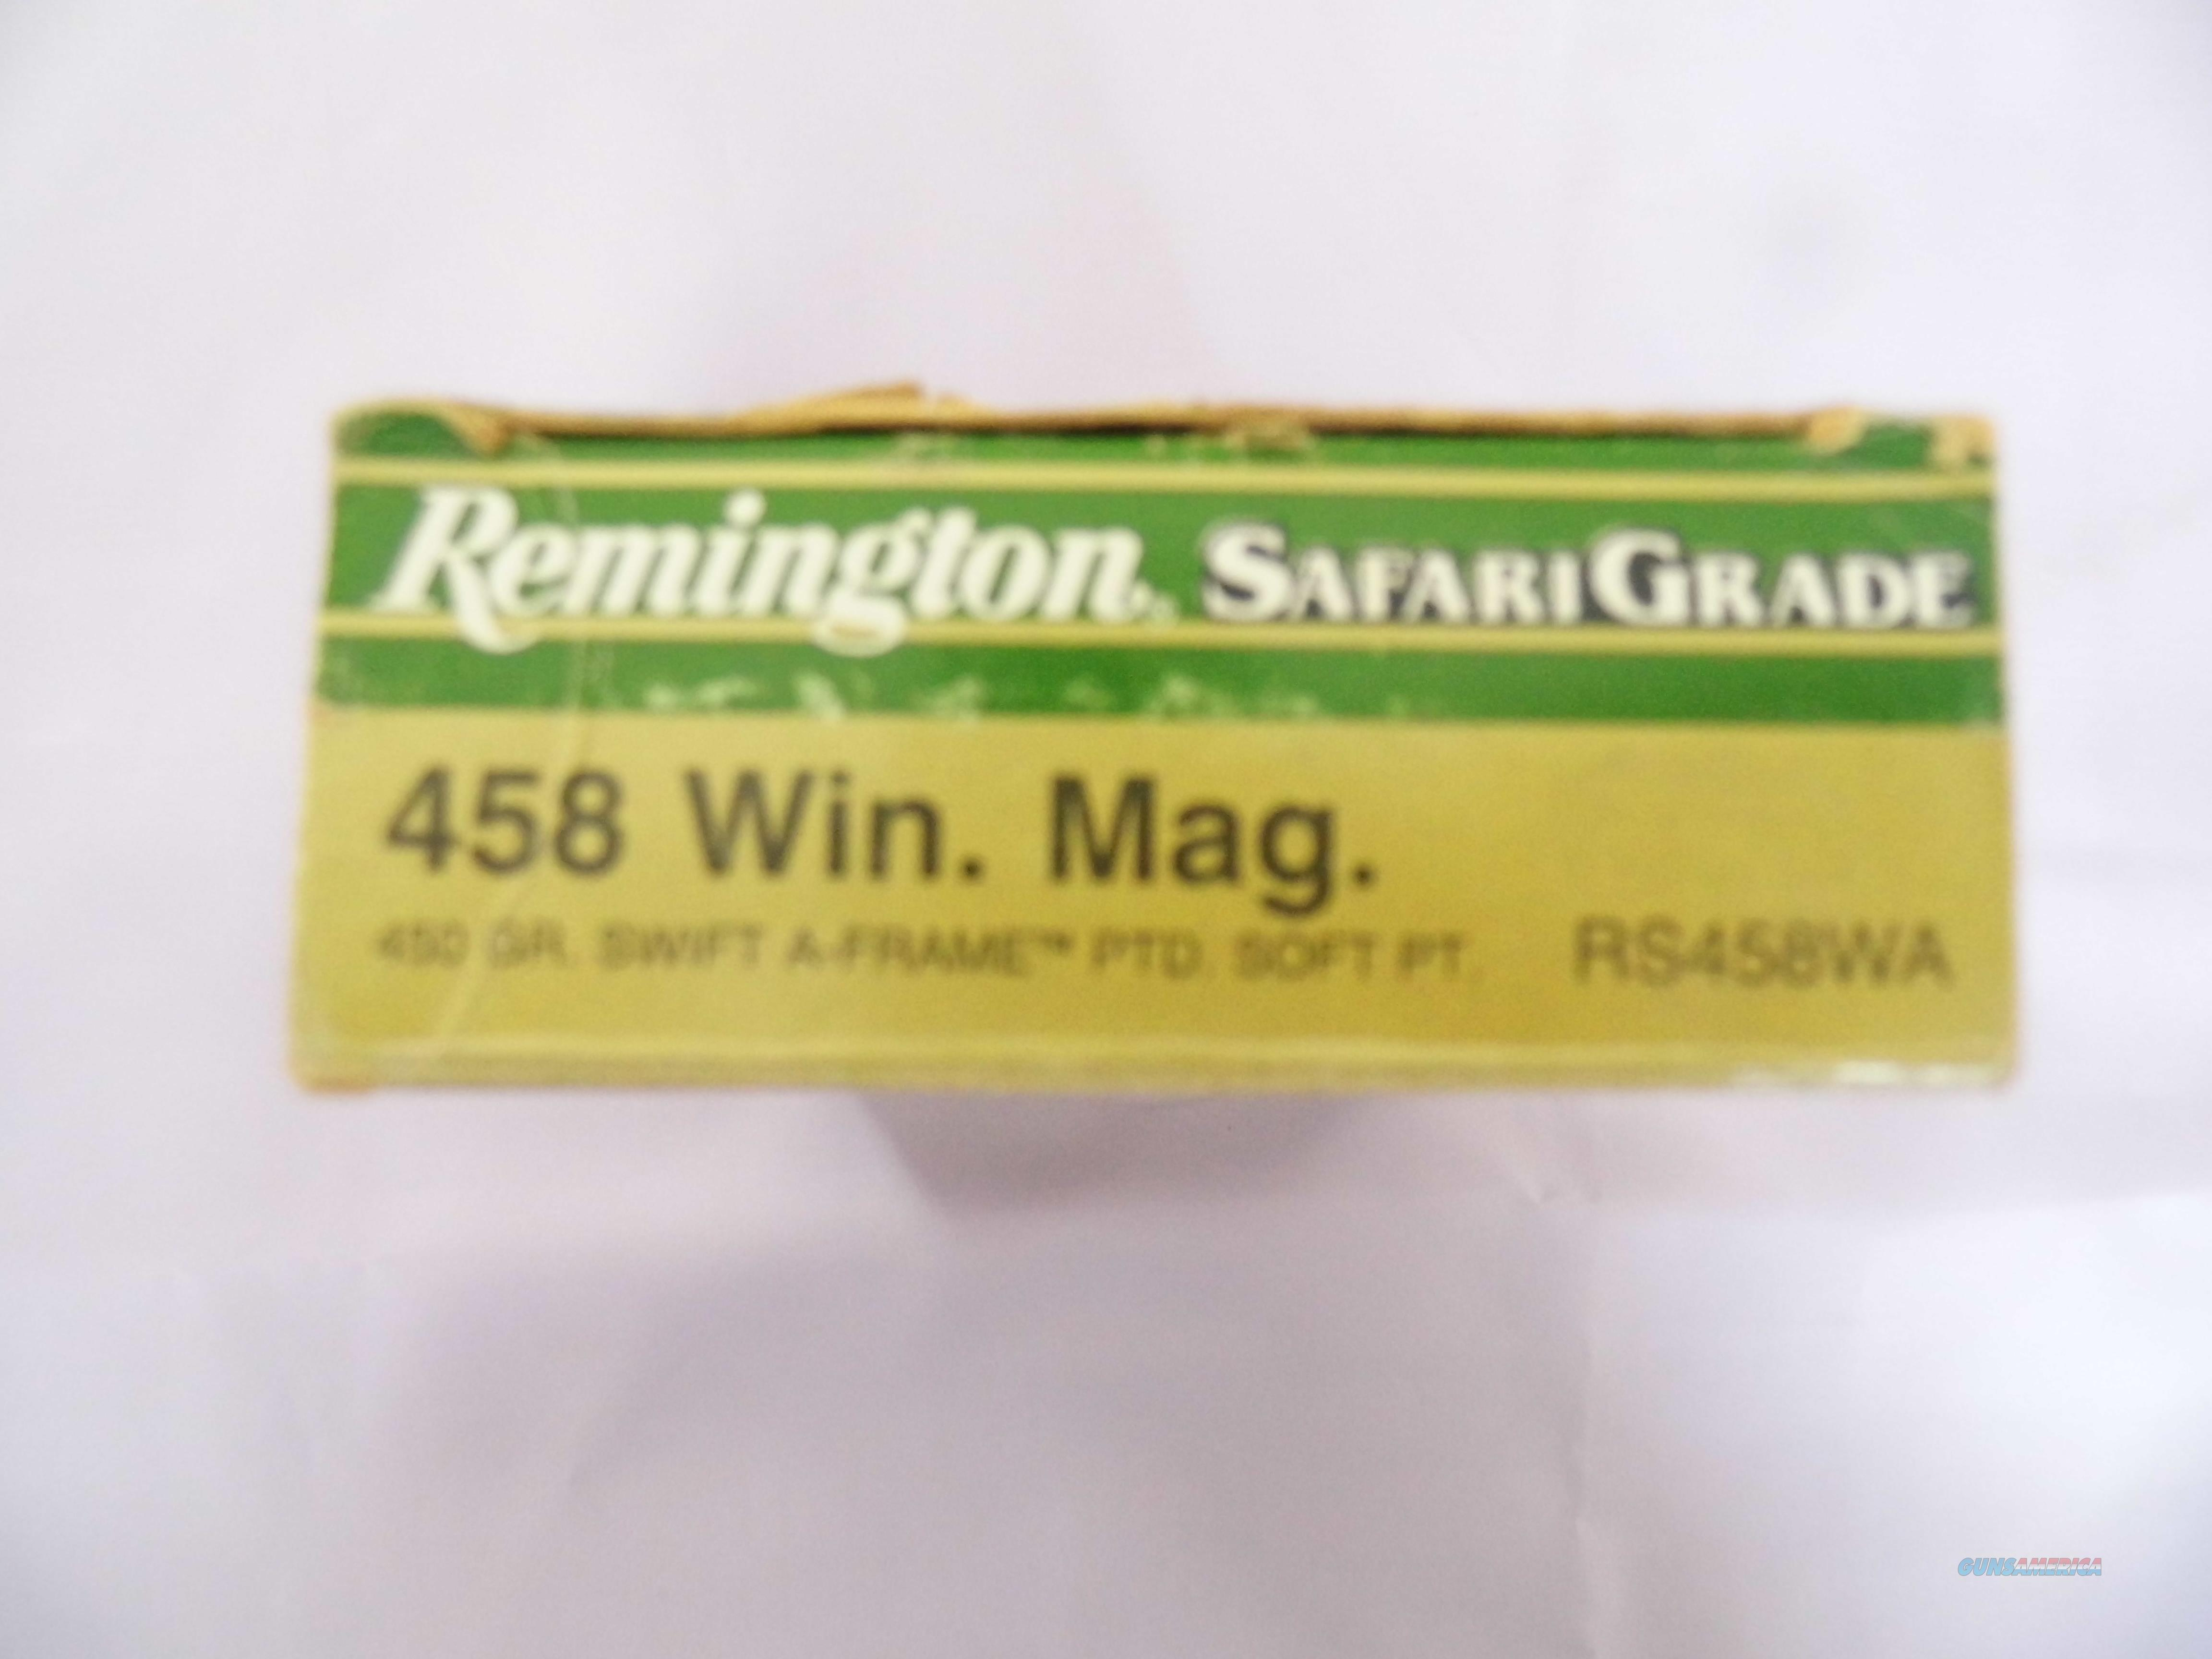 458 Remington Safari Grade 458 Win. Mag. One box of 20 rounds, 450 GR. Swift A-Frame  PTD Soft Pt.  Non-Guns > Ammunition